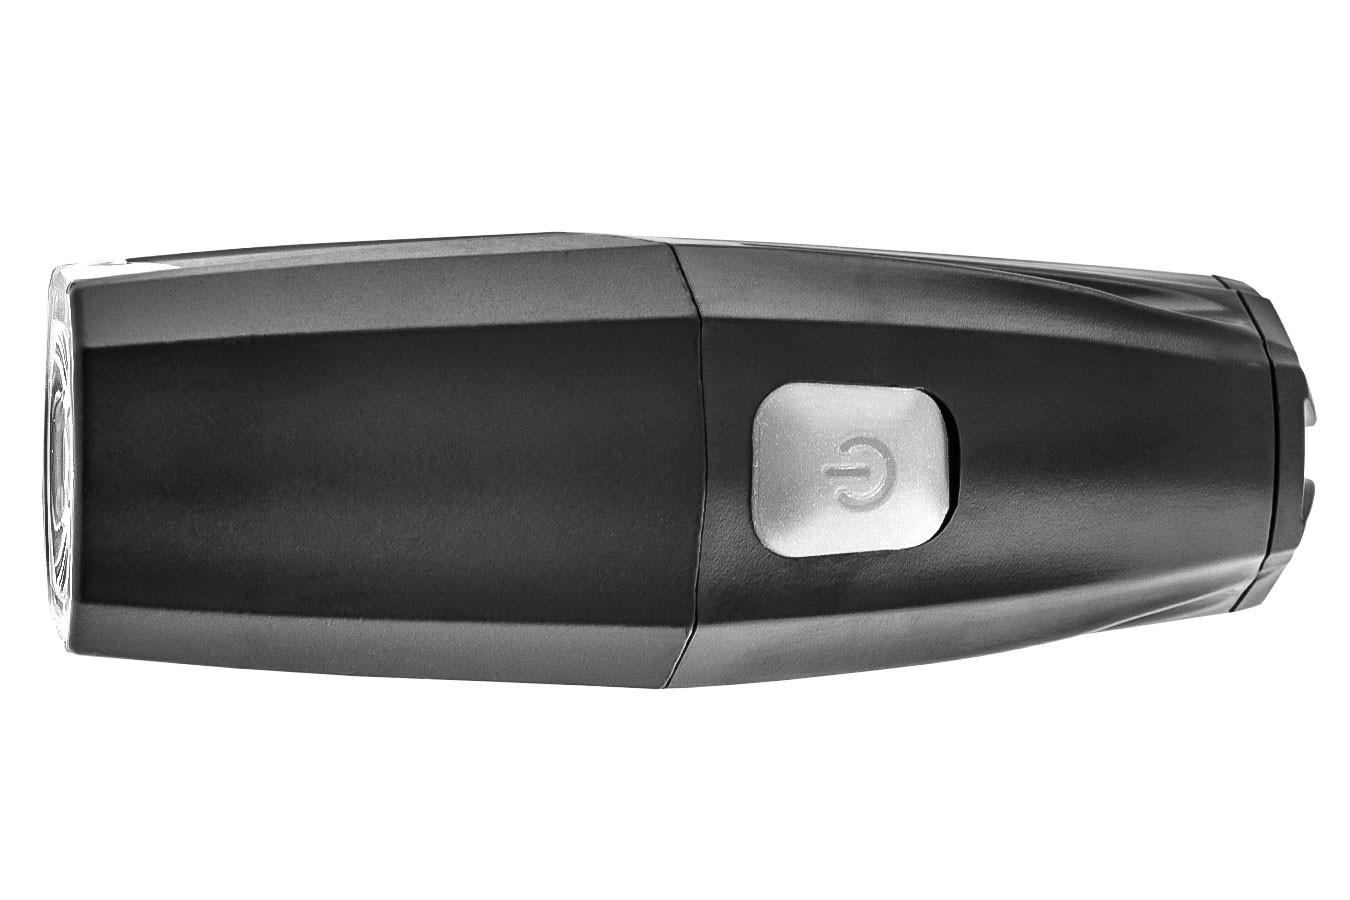 Farol Recarregável 700 Lúmens JY-7029 USB - Absolute